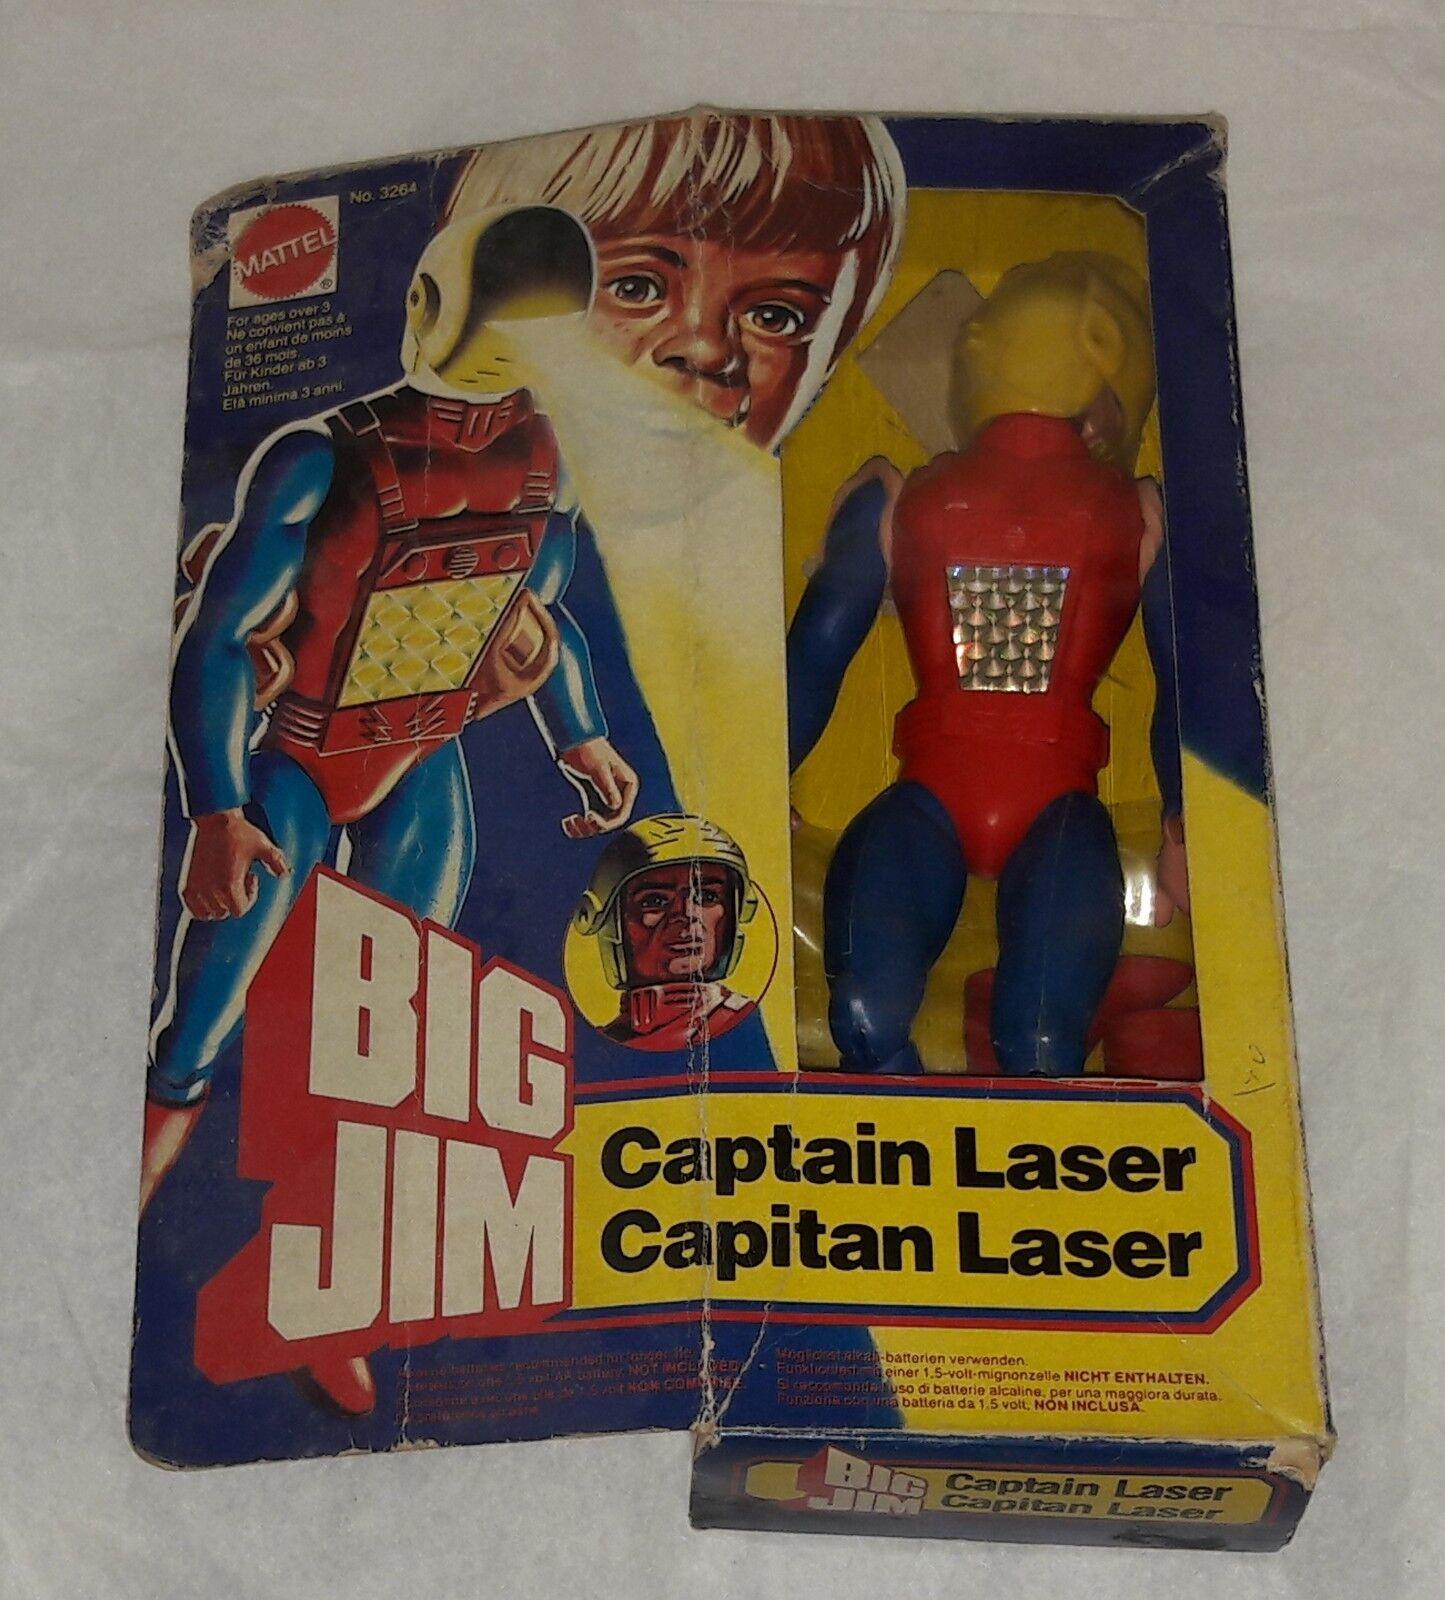 BIG JIM CAPTAIN LASER - Mattel 1984 Neuf MISB New